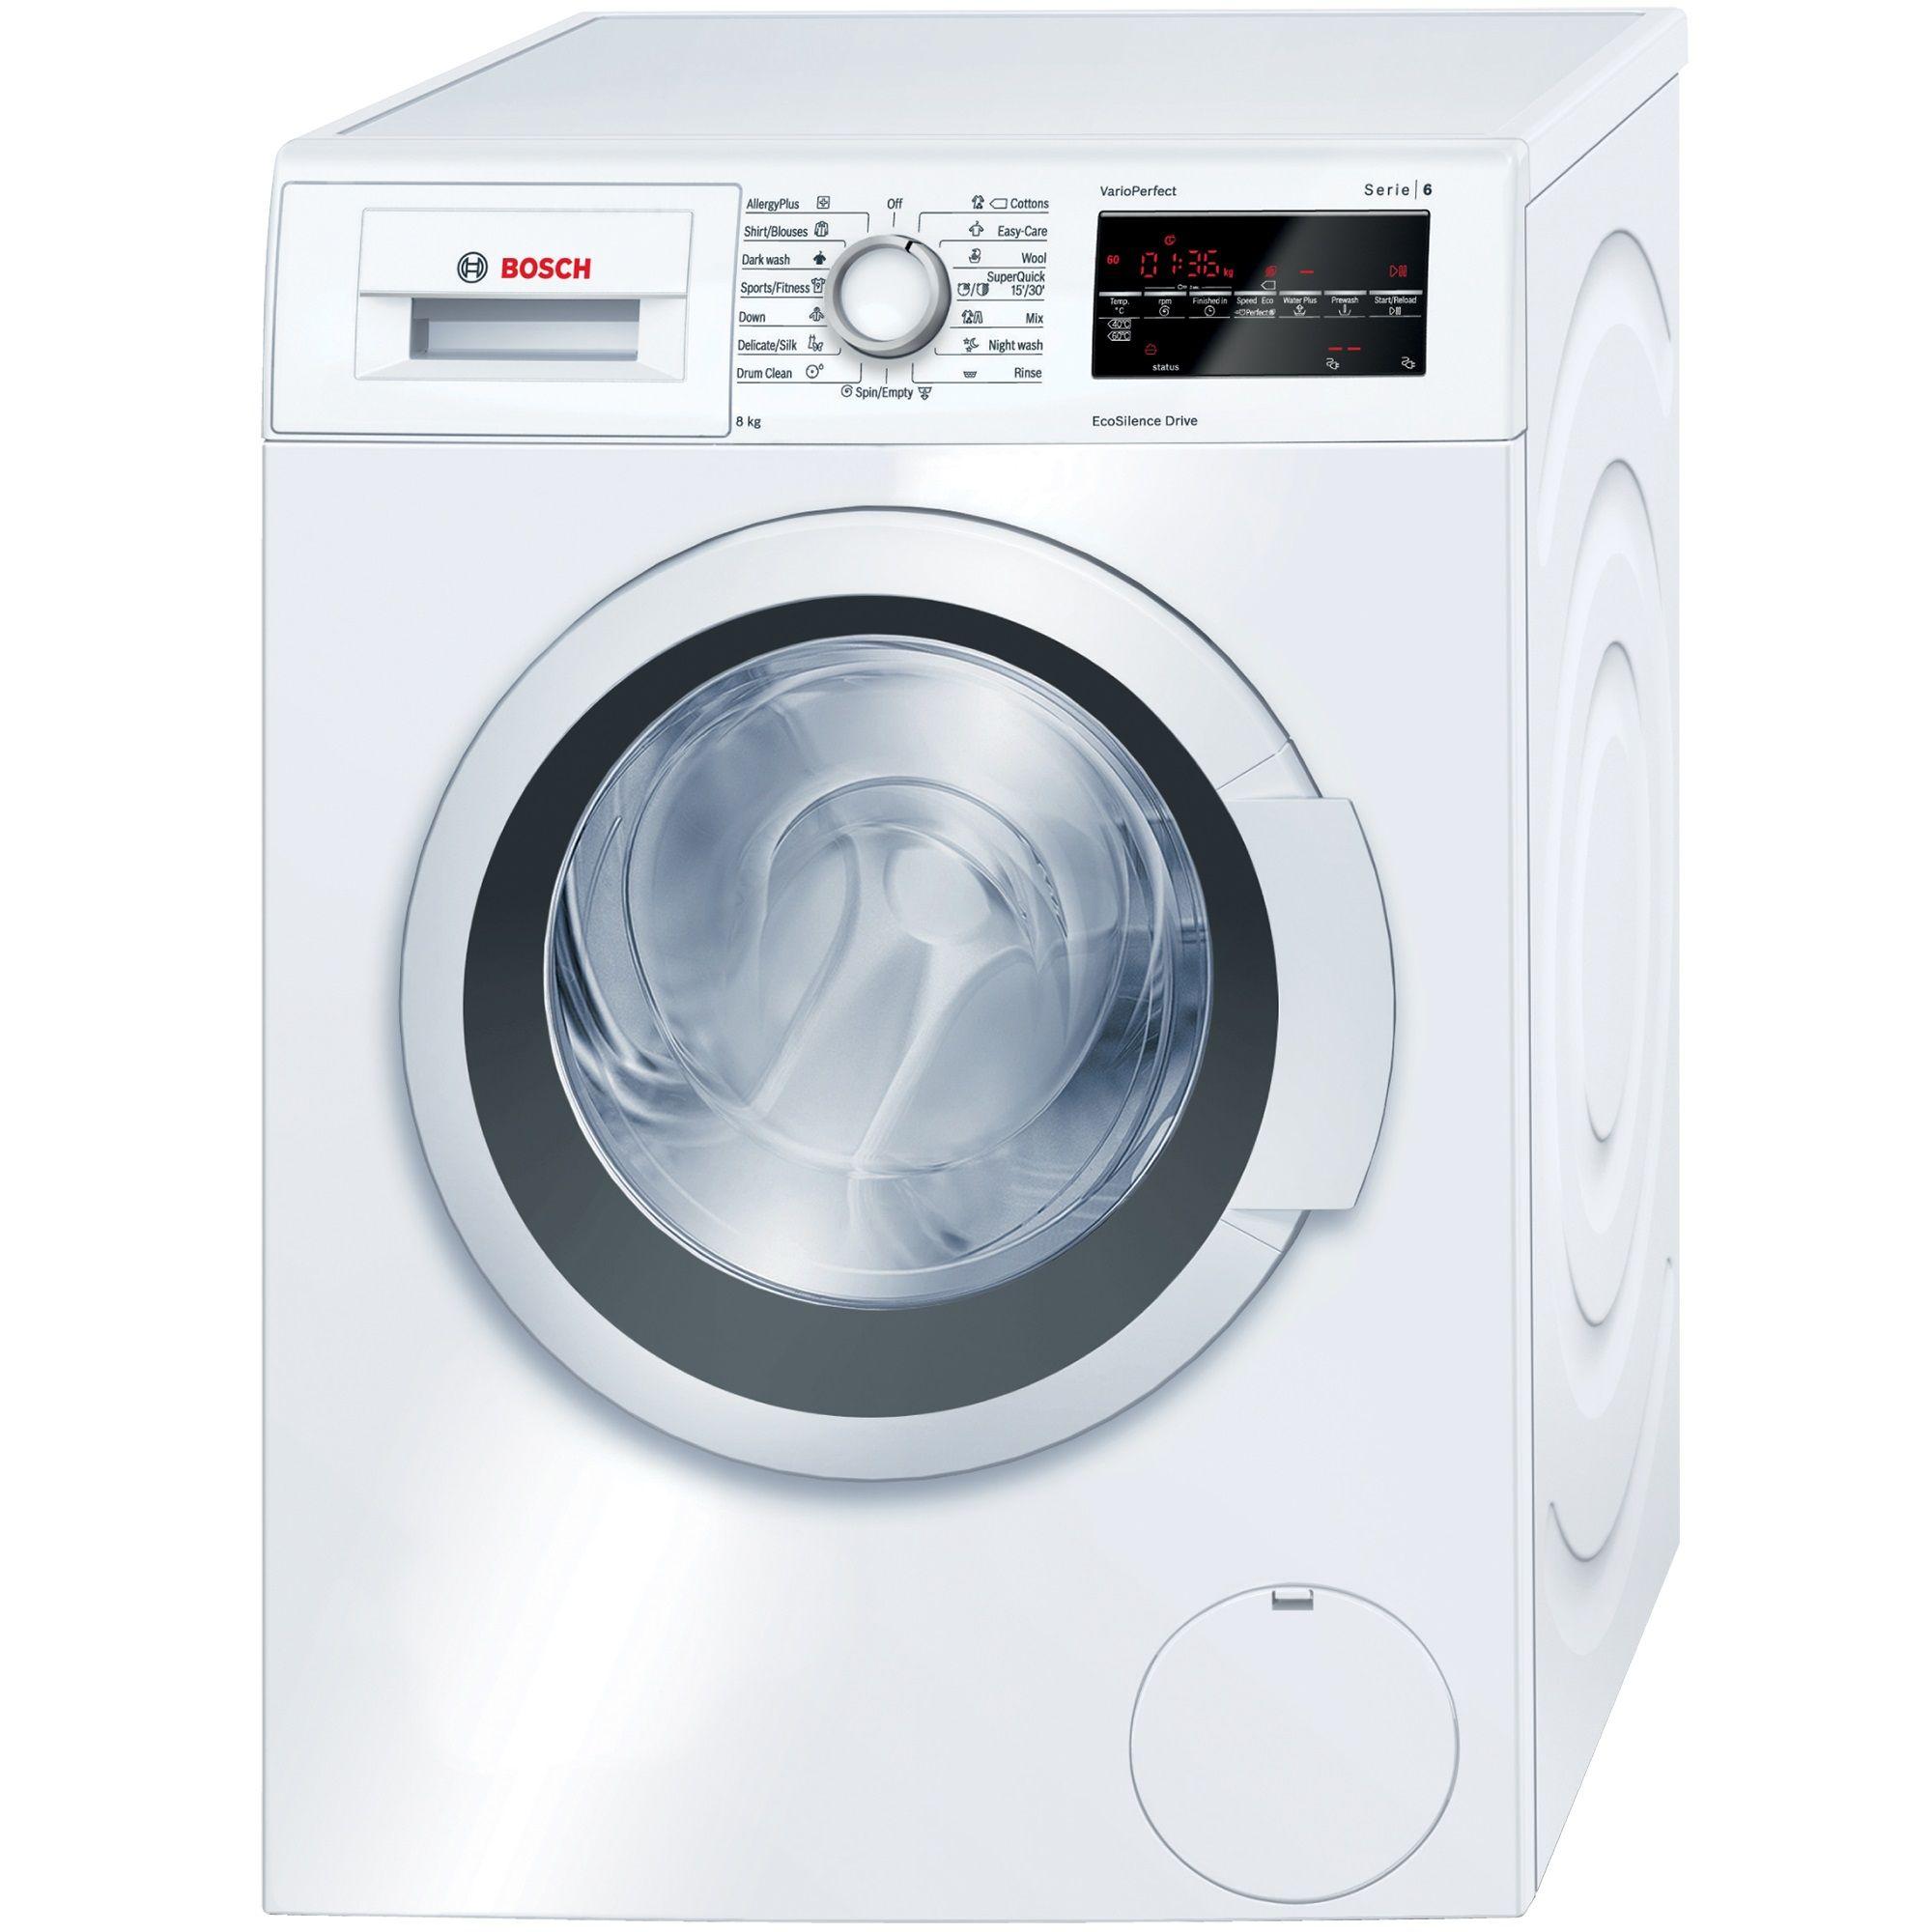 Пералня Bosch WAT28460BY, 8 кг, 1400 об/мин, Клас A+++, Дисплей LED, Бяла